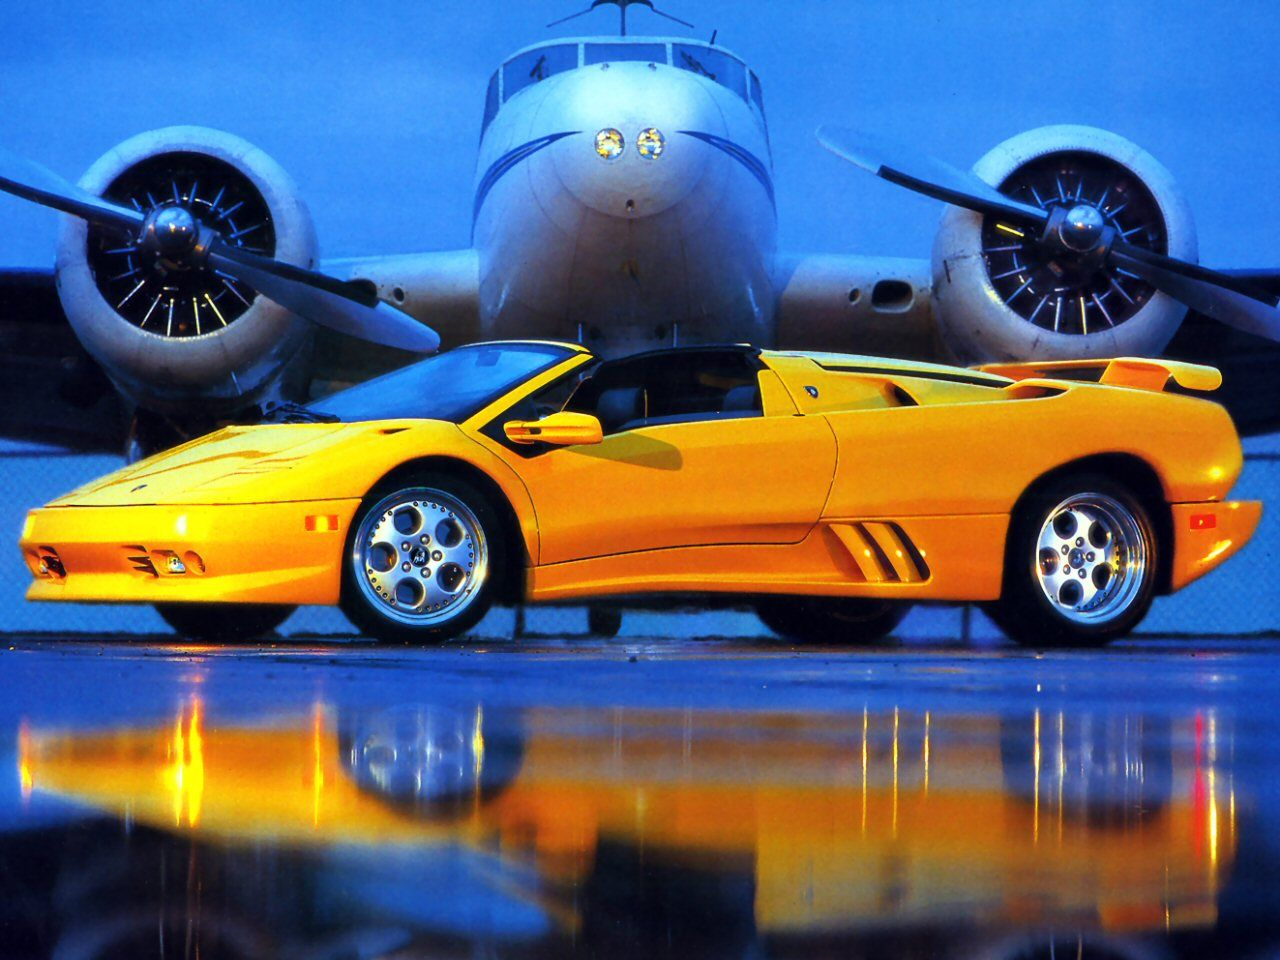 Delicieux Lamborghini Diablo Roadster